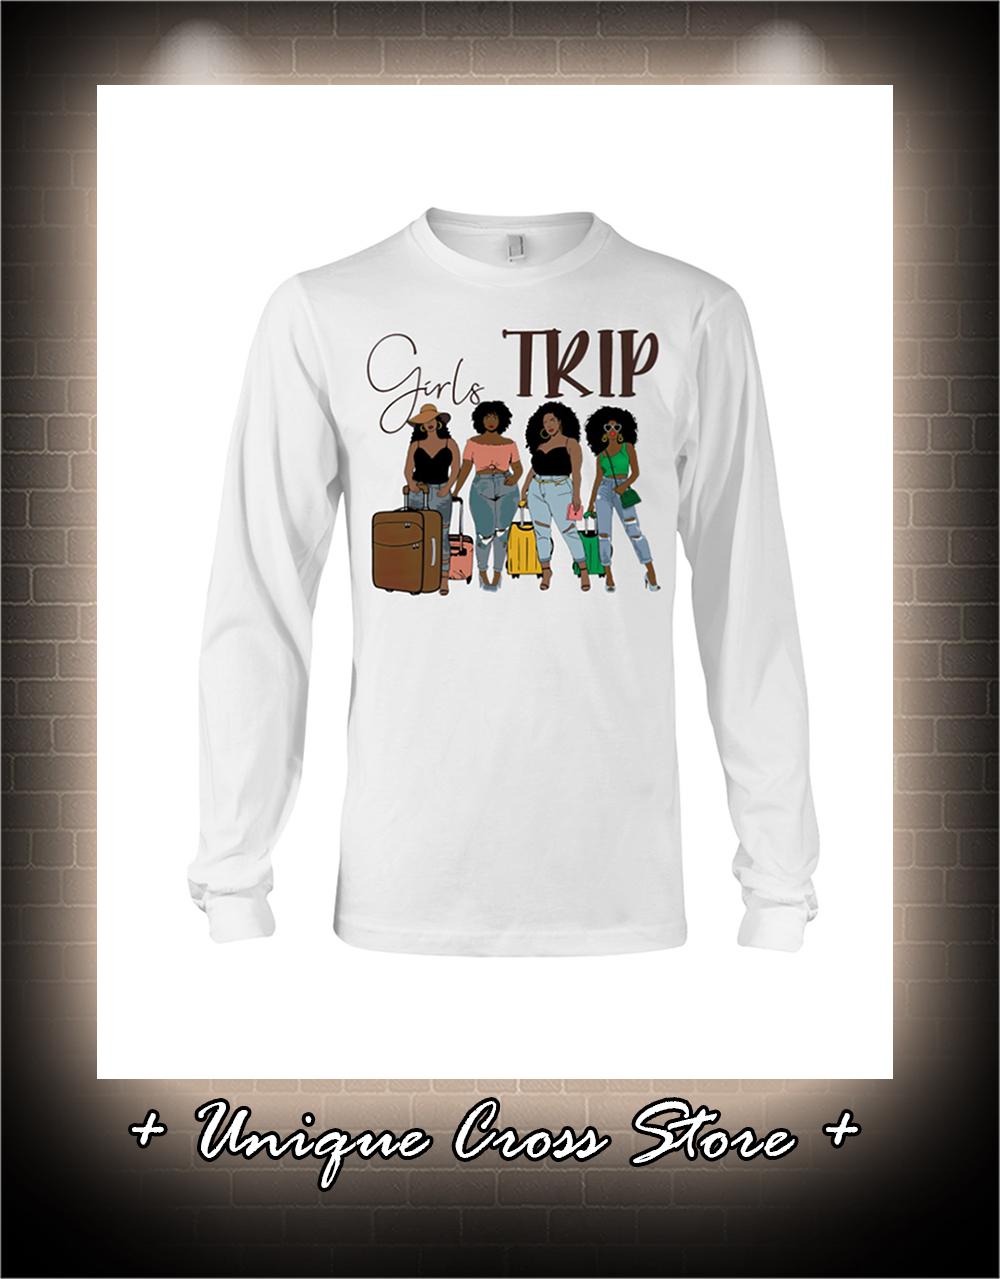 Black Girl Girls Trip Shirt